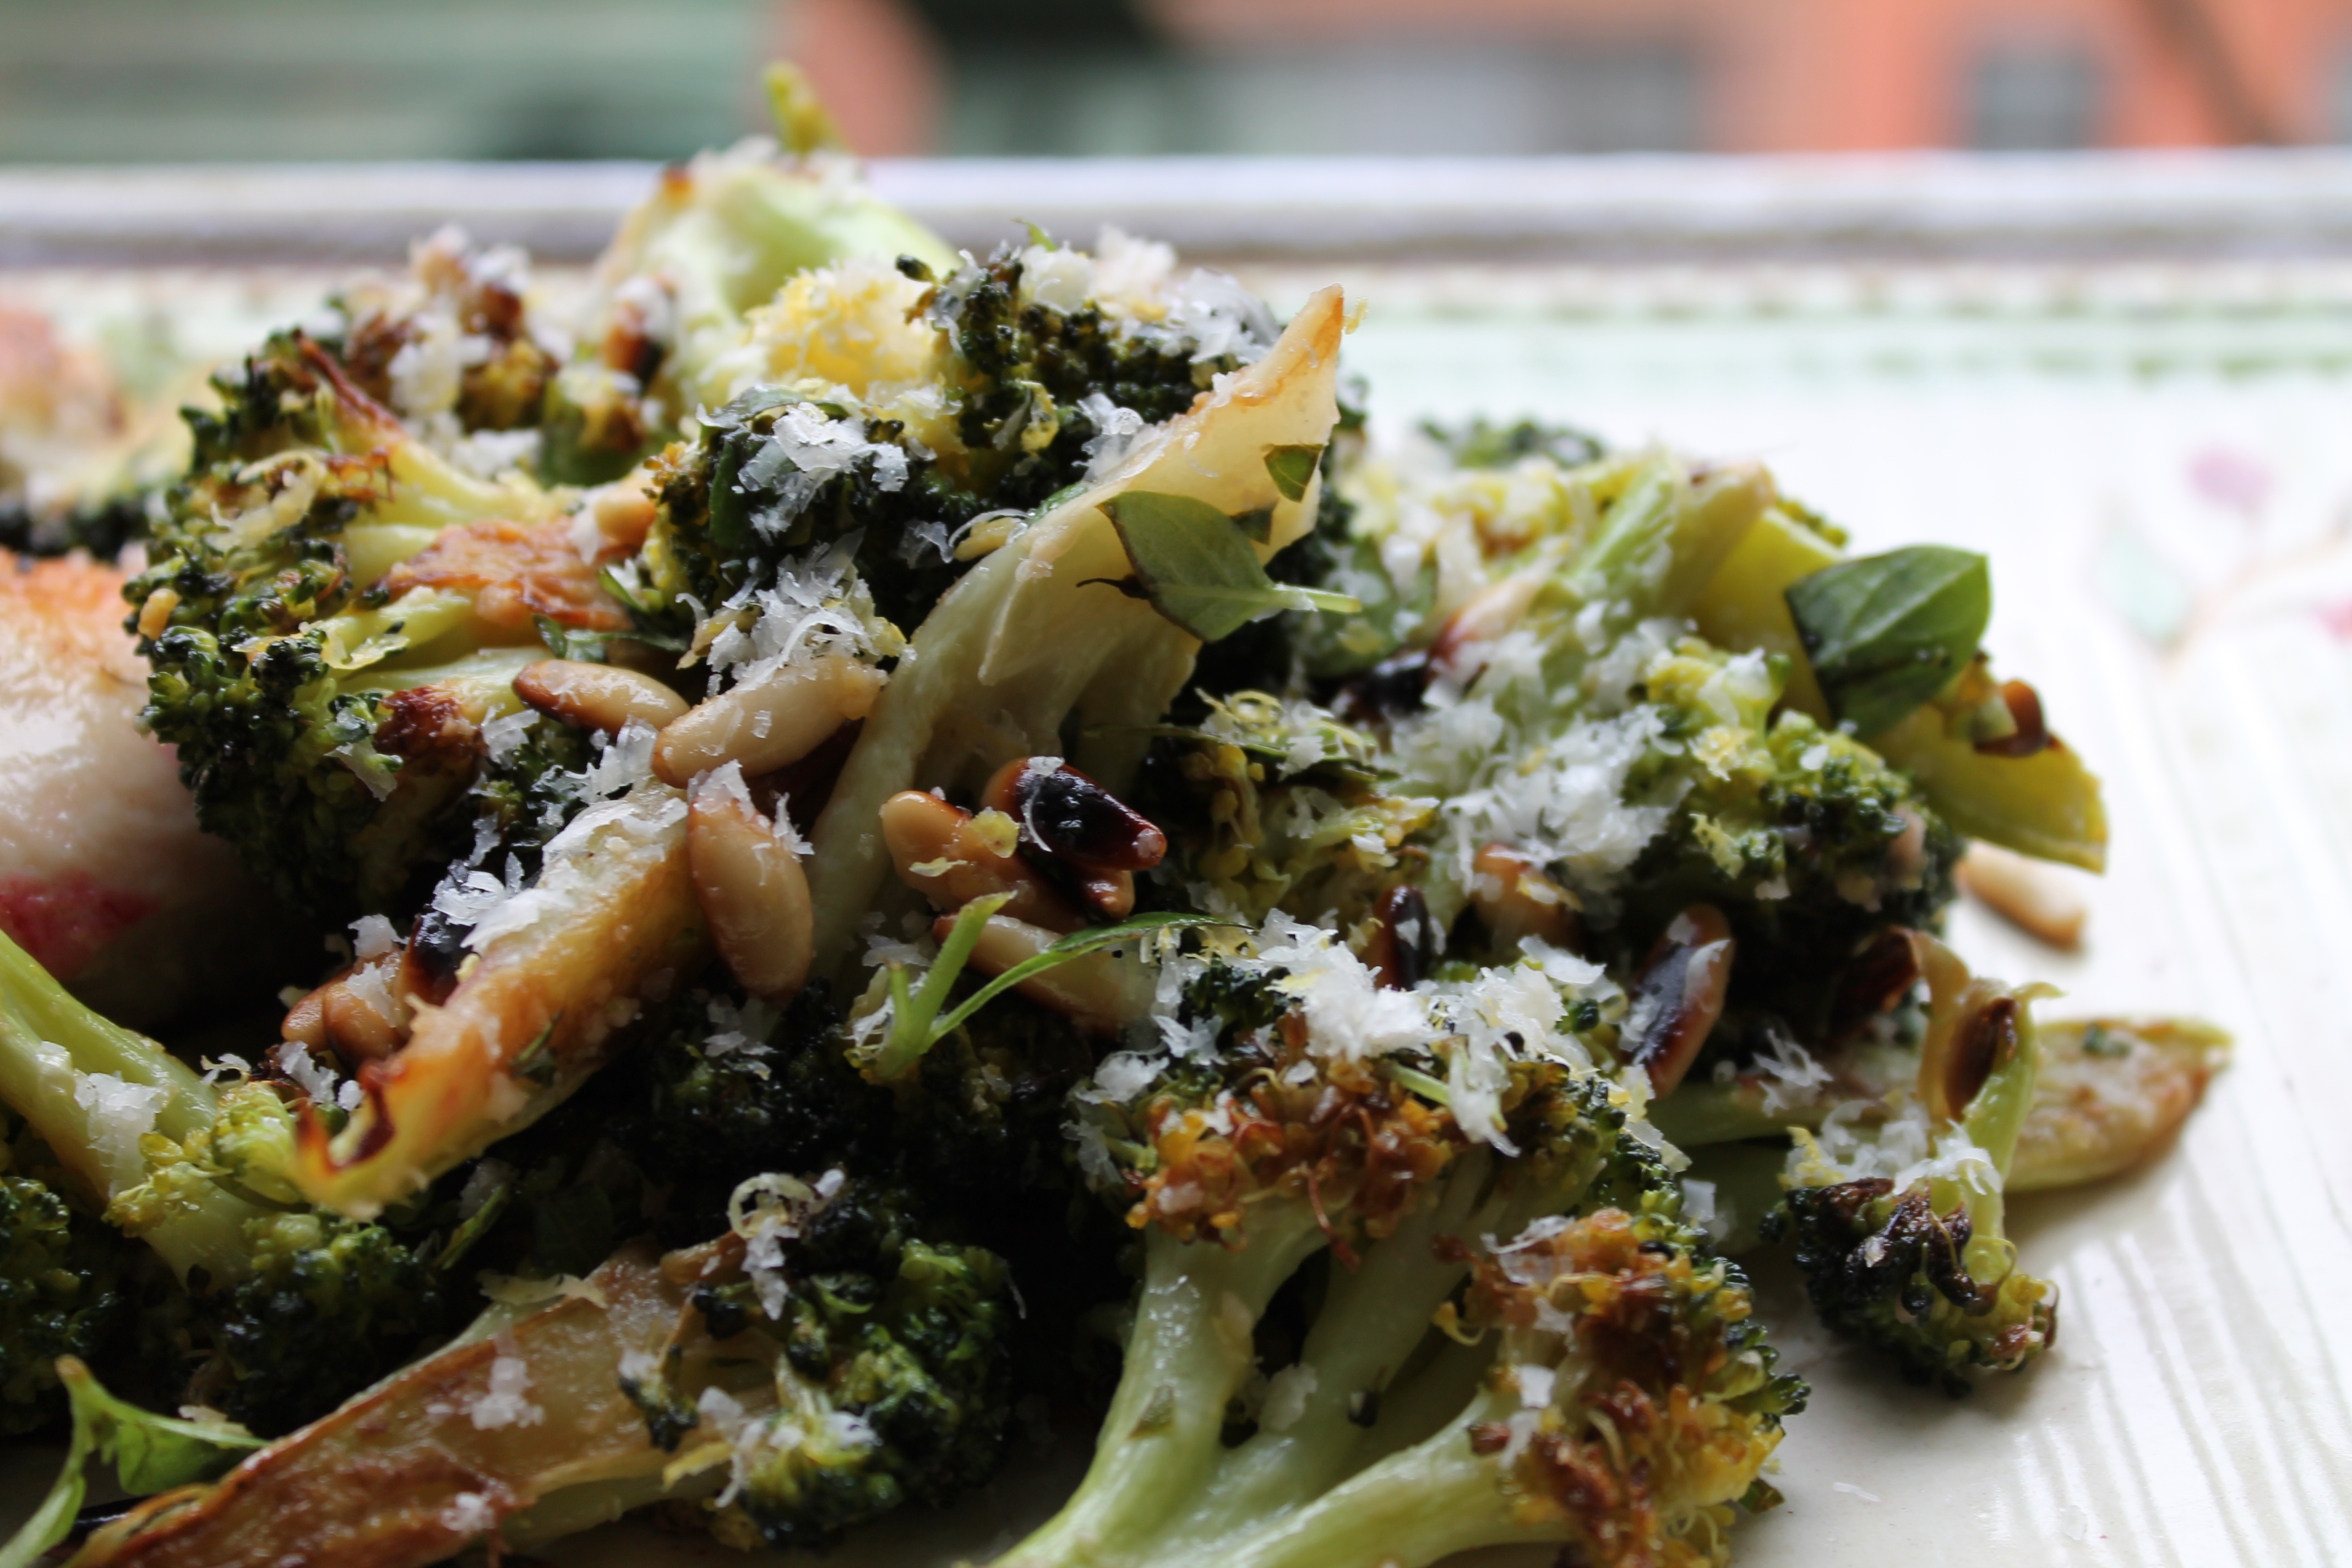 ... Broccoli with Parmesan, Lemon, Basil and Pine Nuts | penthouse kitchen